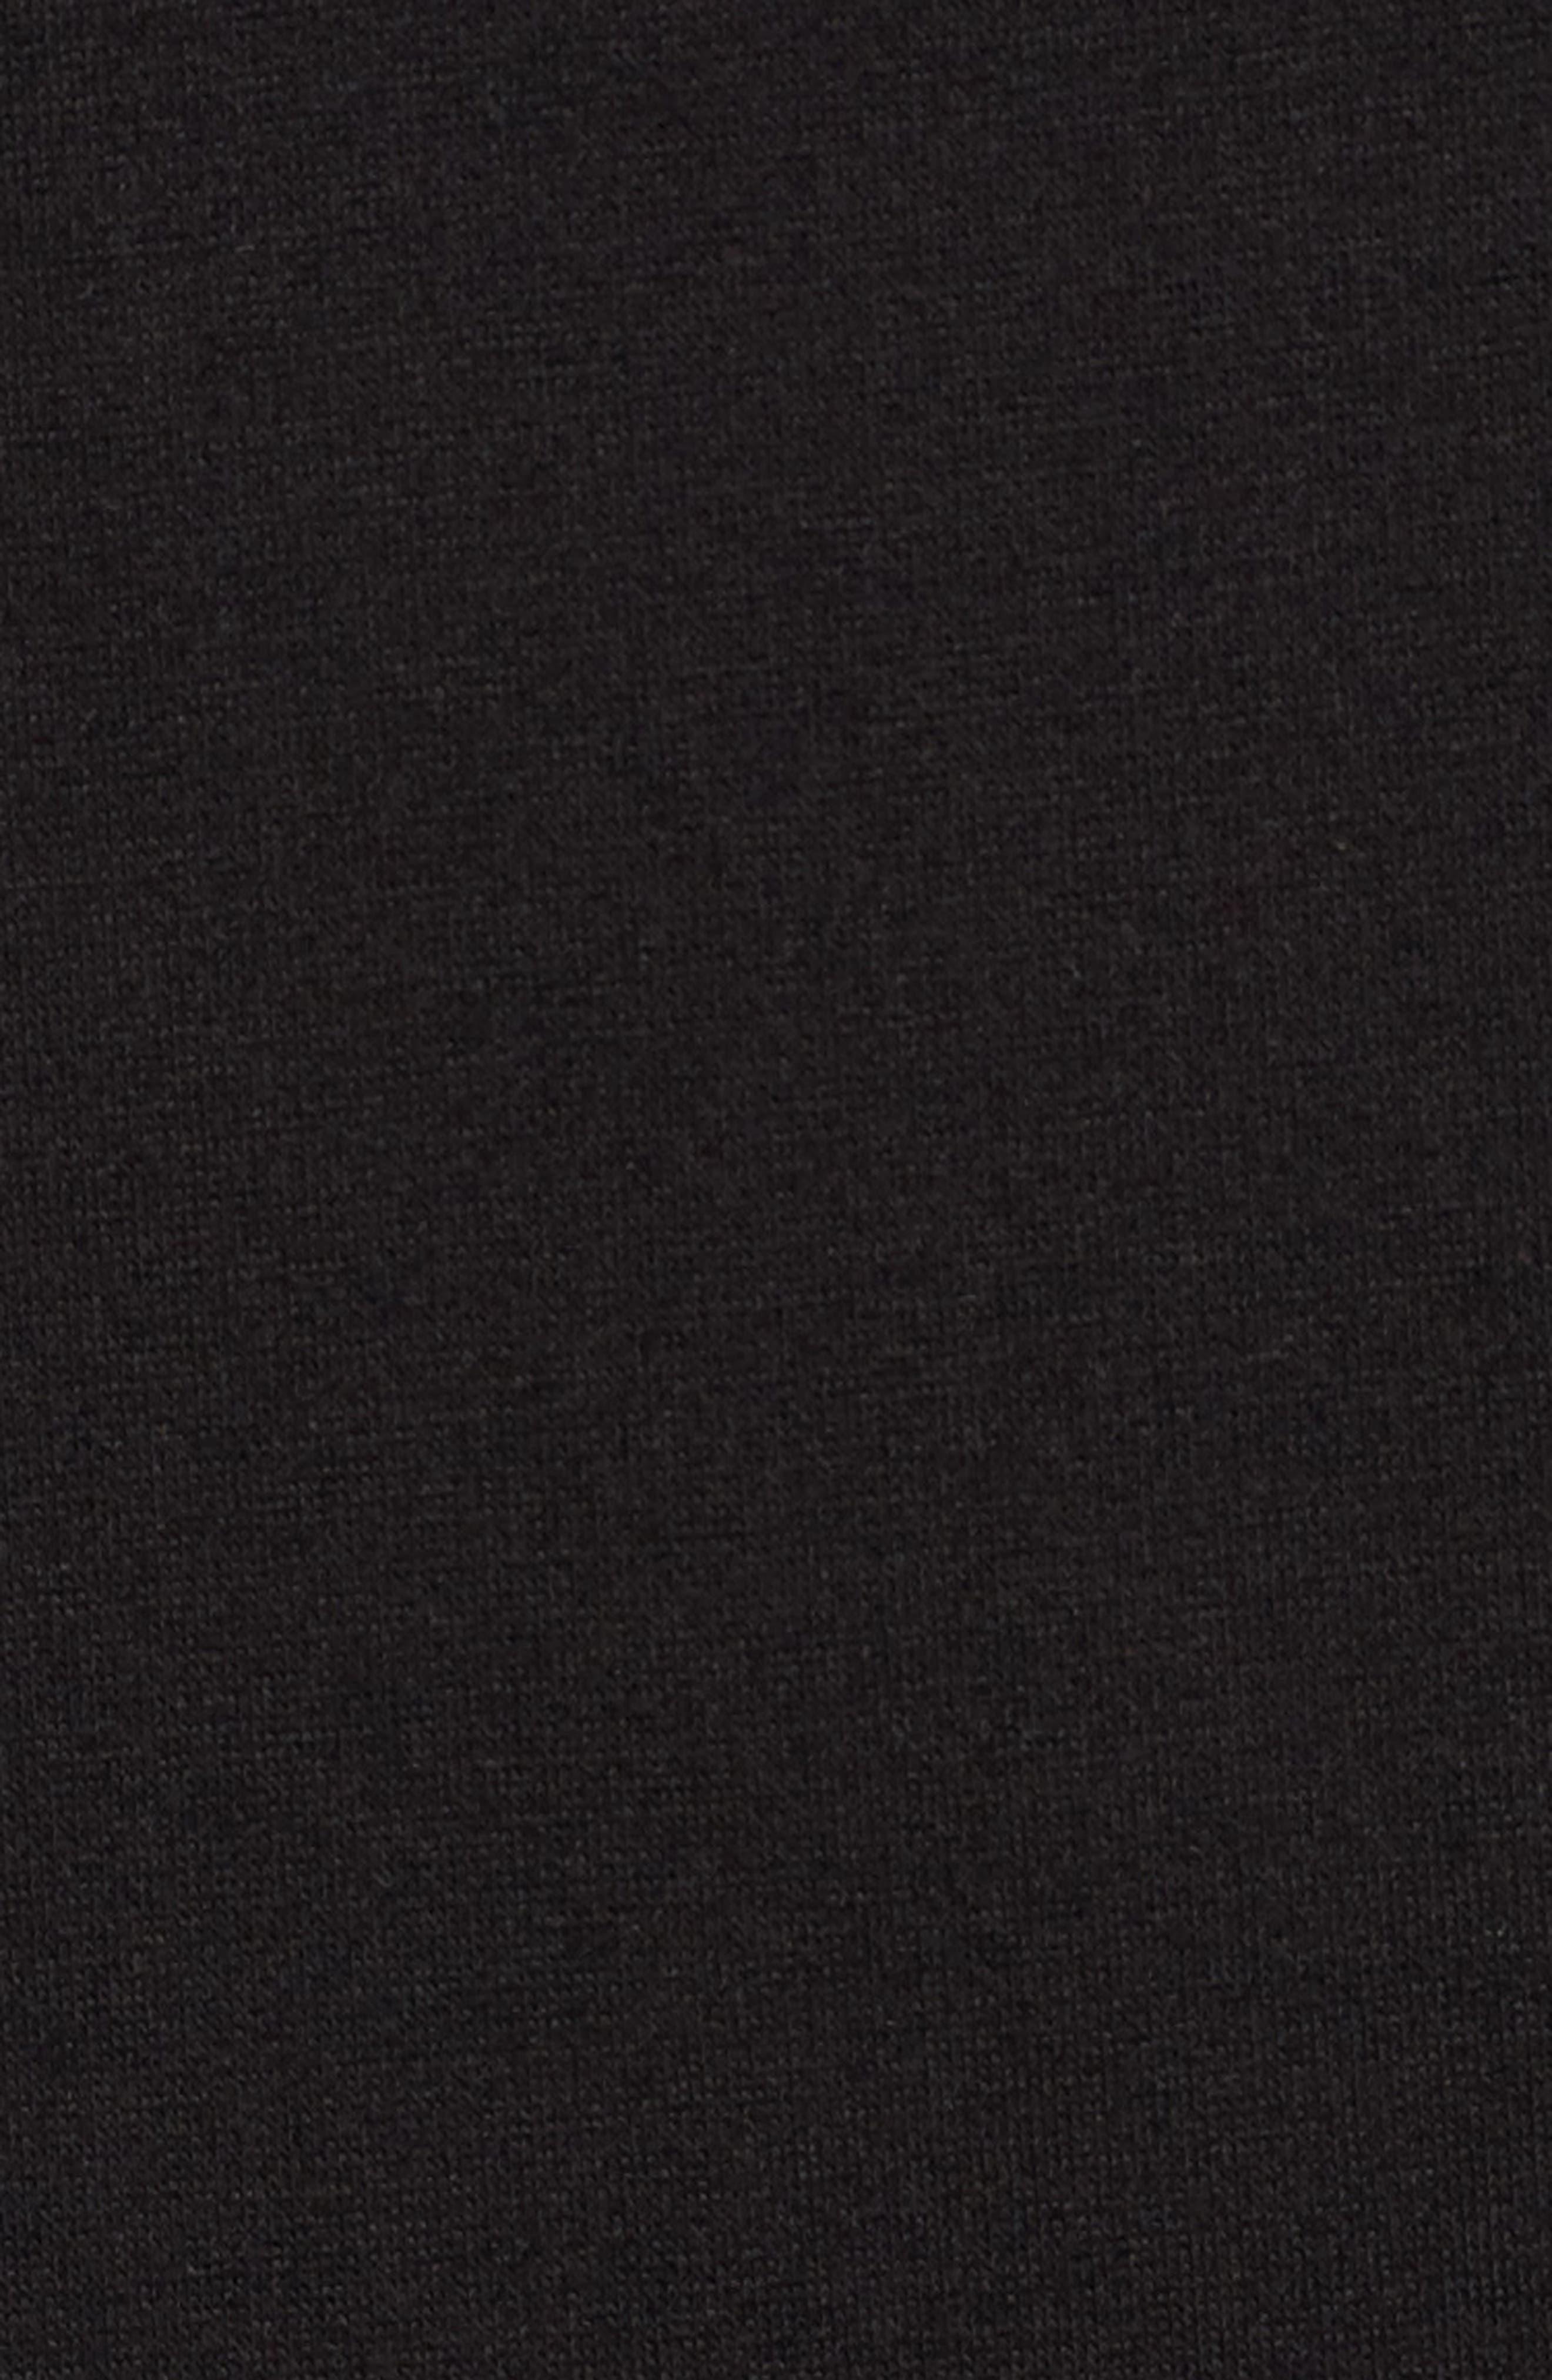 Ruffle Sleeve T-Shirt Dress,                             Alternate thumbnail 5, color,                             BLACK